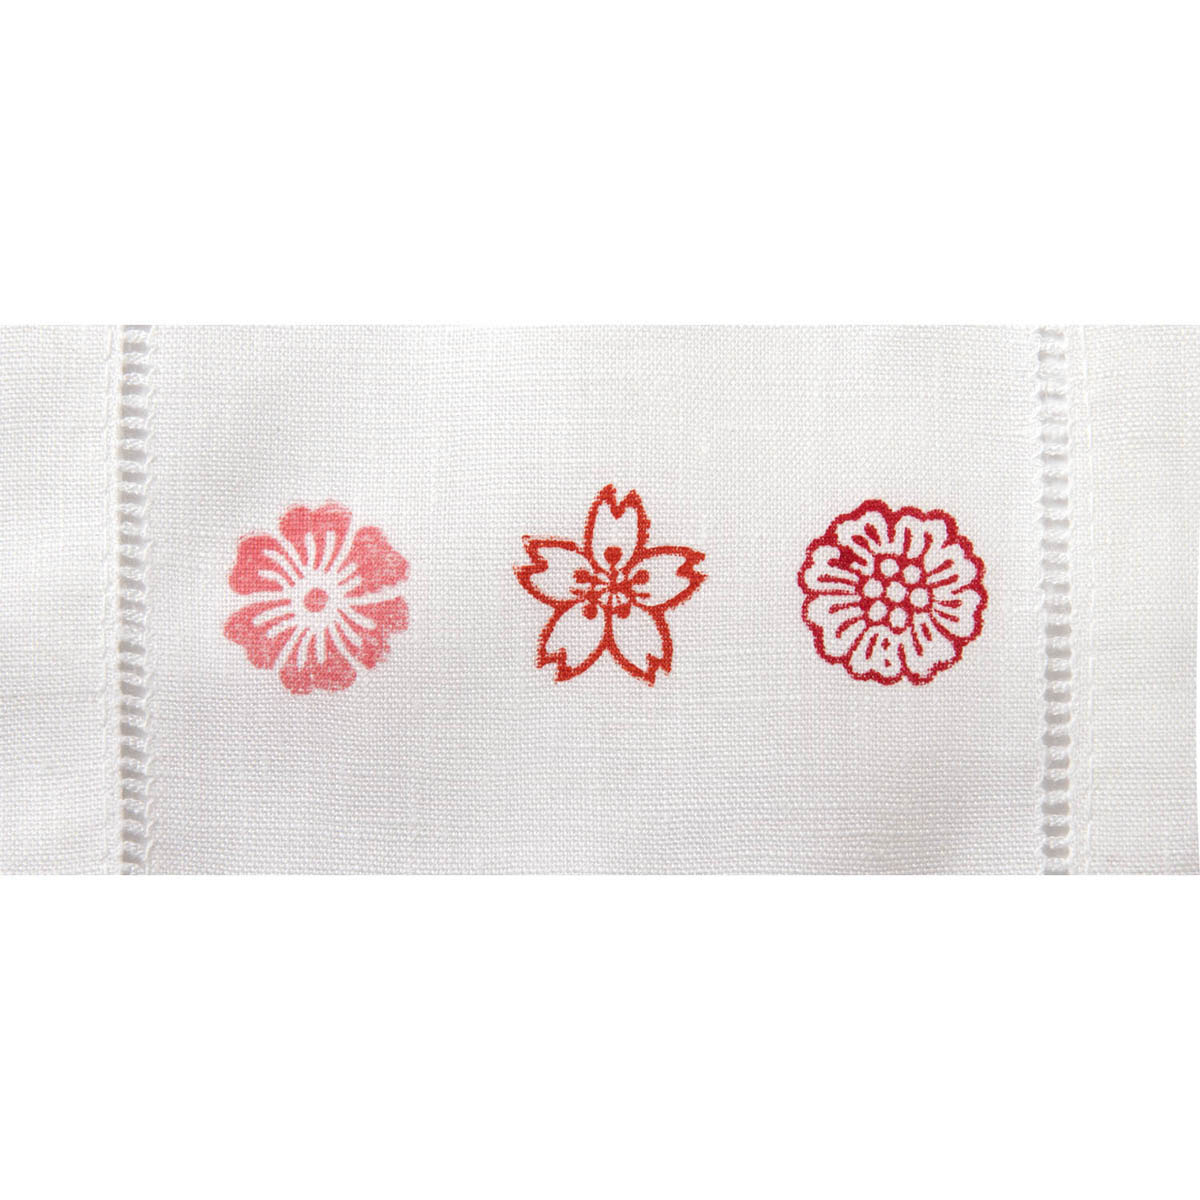 Fabric Creations™ Block Printing Stamps - Mini Set - Floral 1